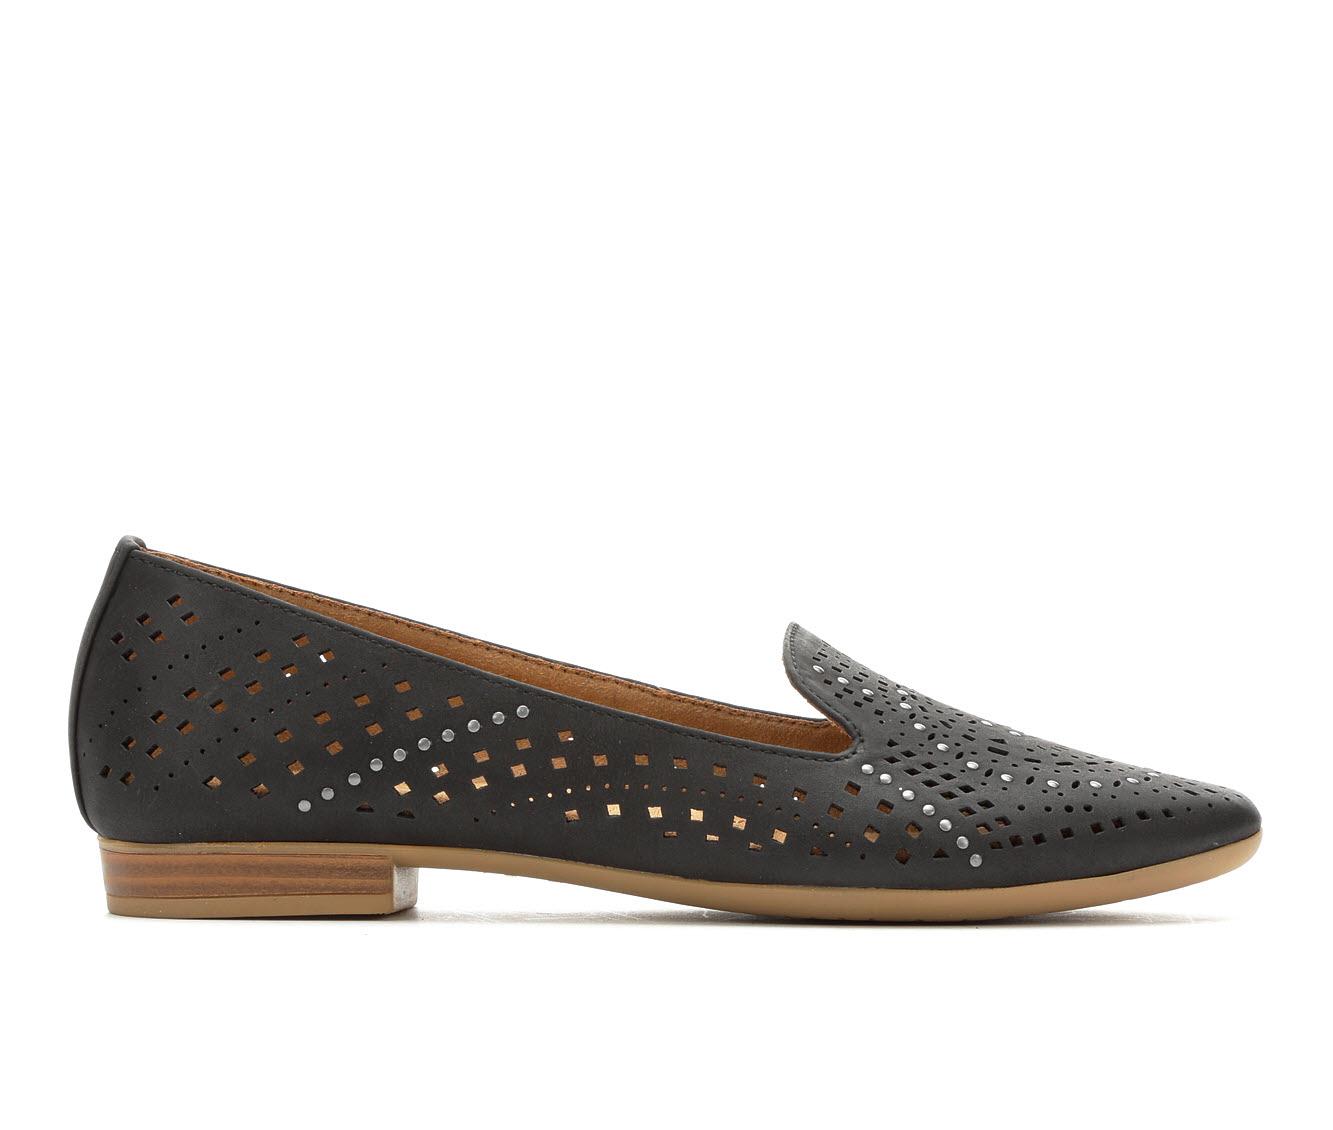 Vintage 7 Eight Rose Women's Shoe (Black Faux Leather)